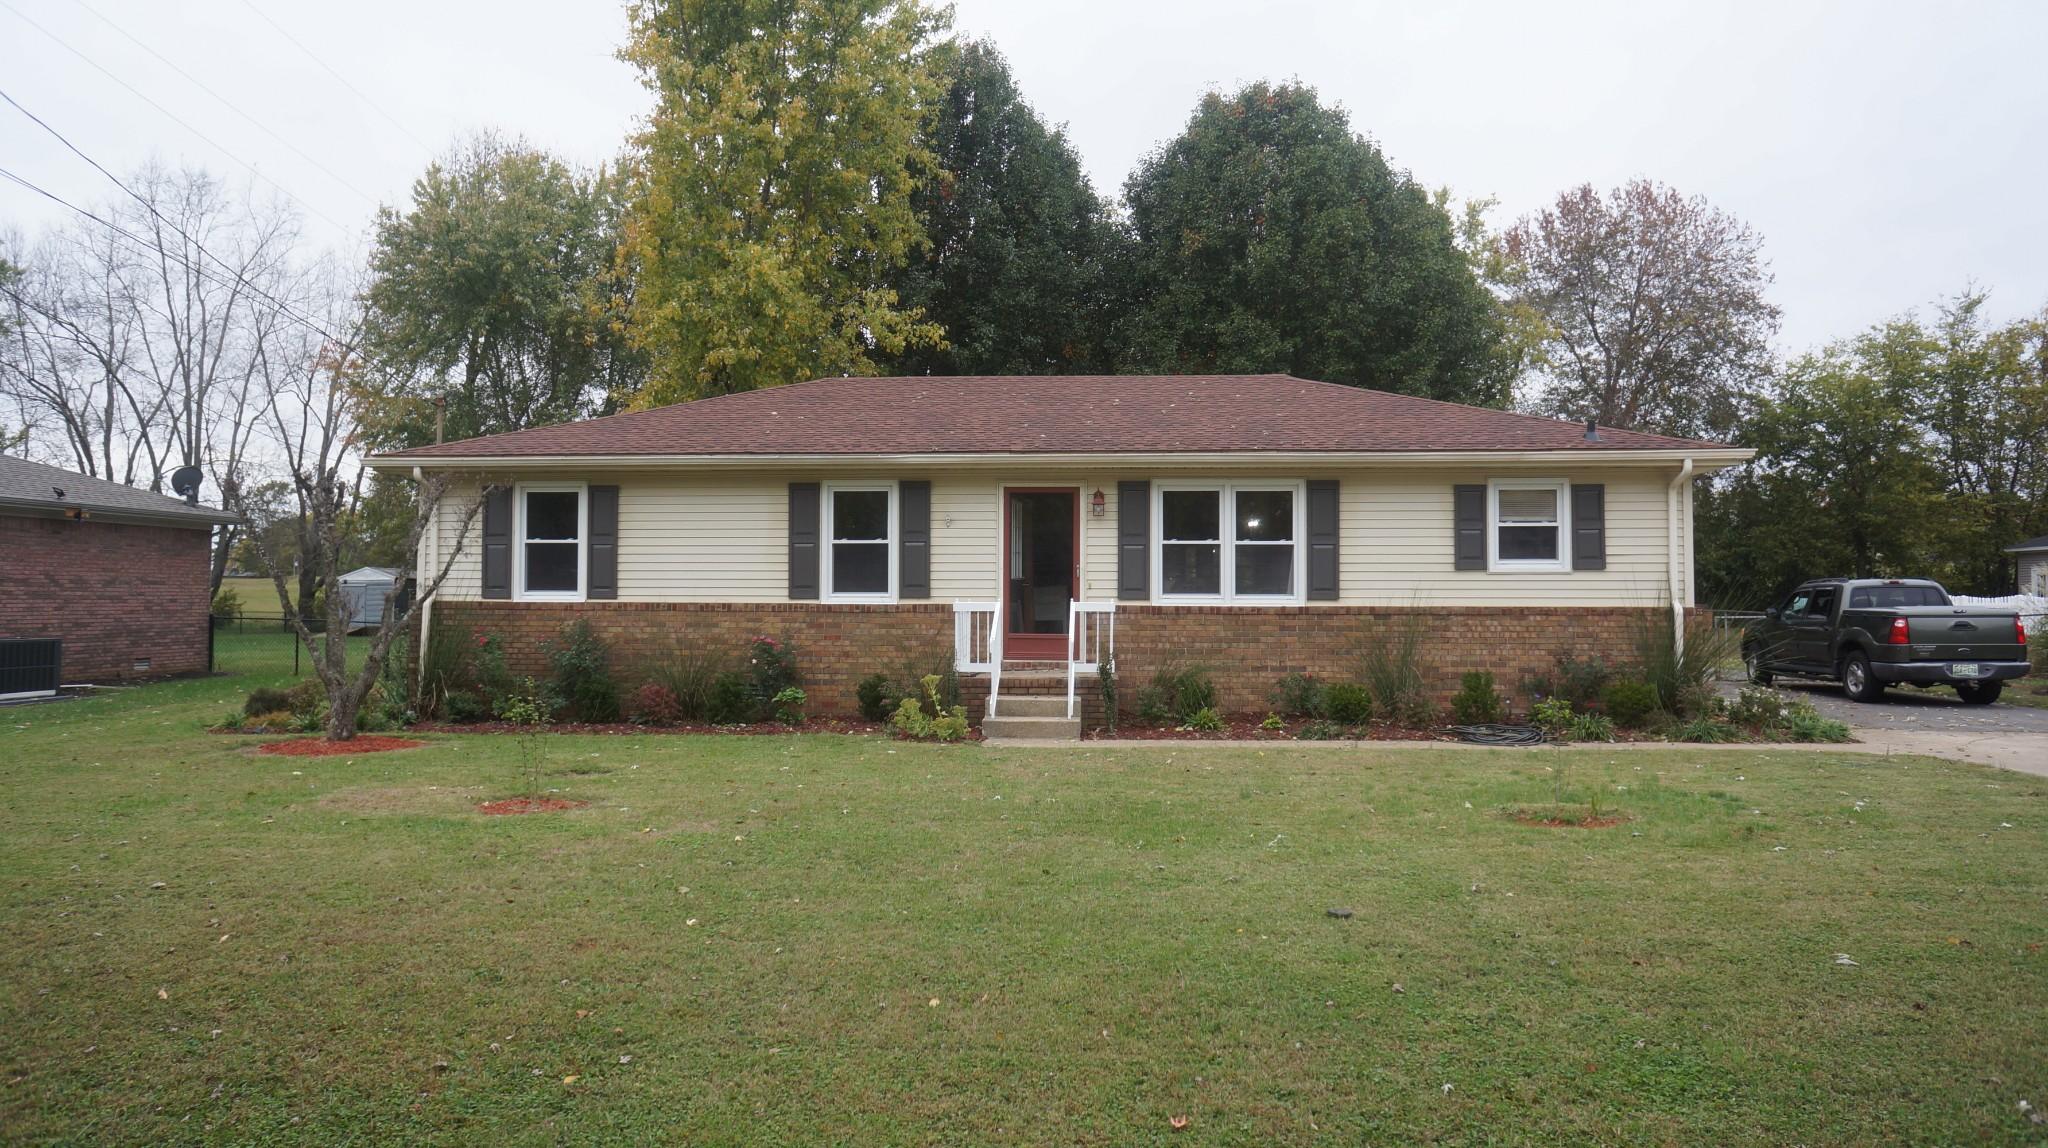 3962 Tanglewood Dr, Hopkinsville, KY 42240 - Hopkinsville, KY real estate listing